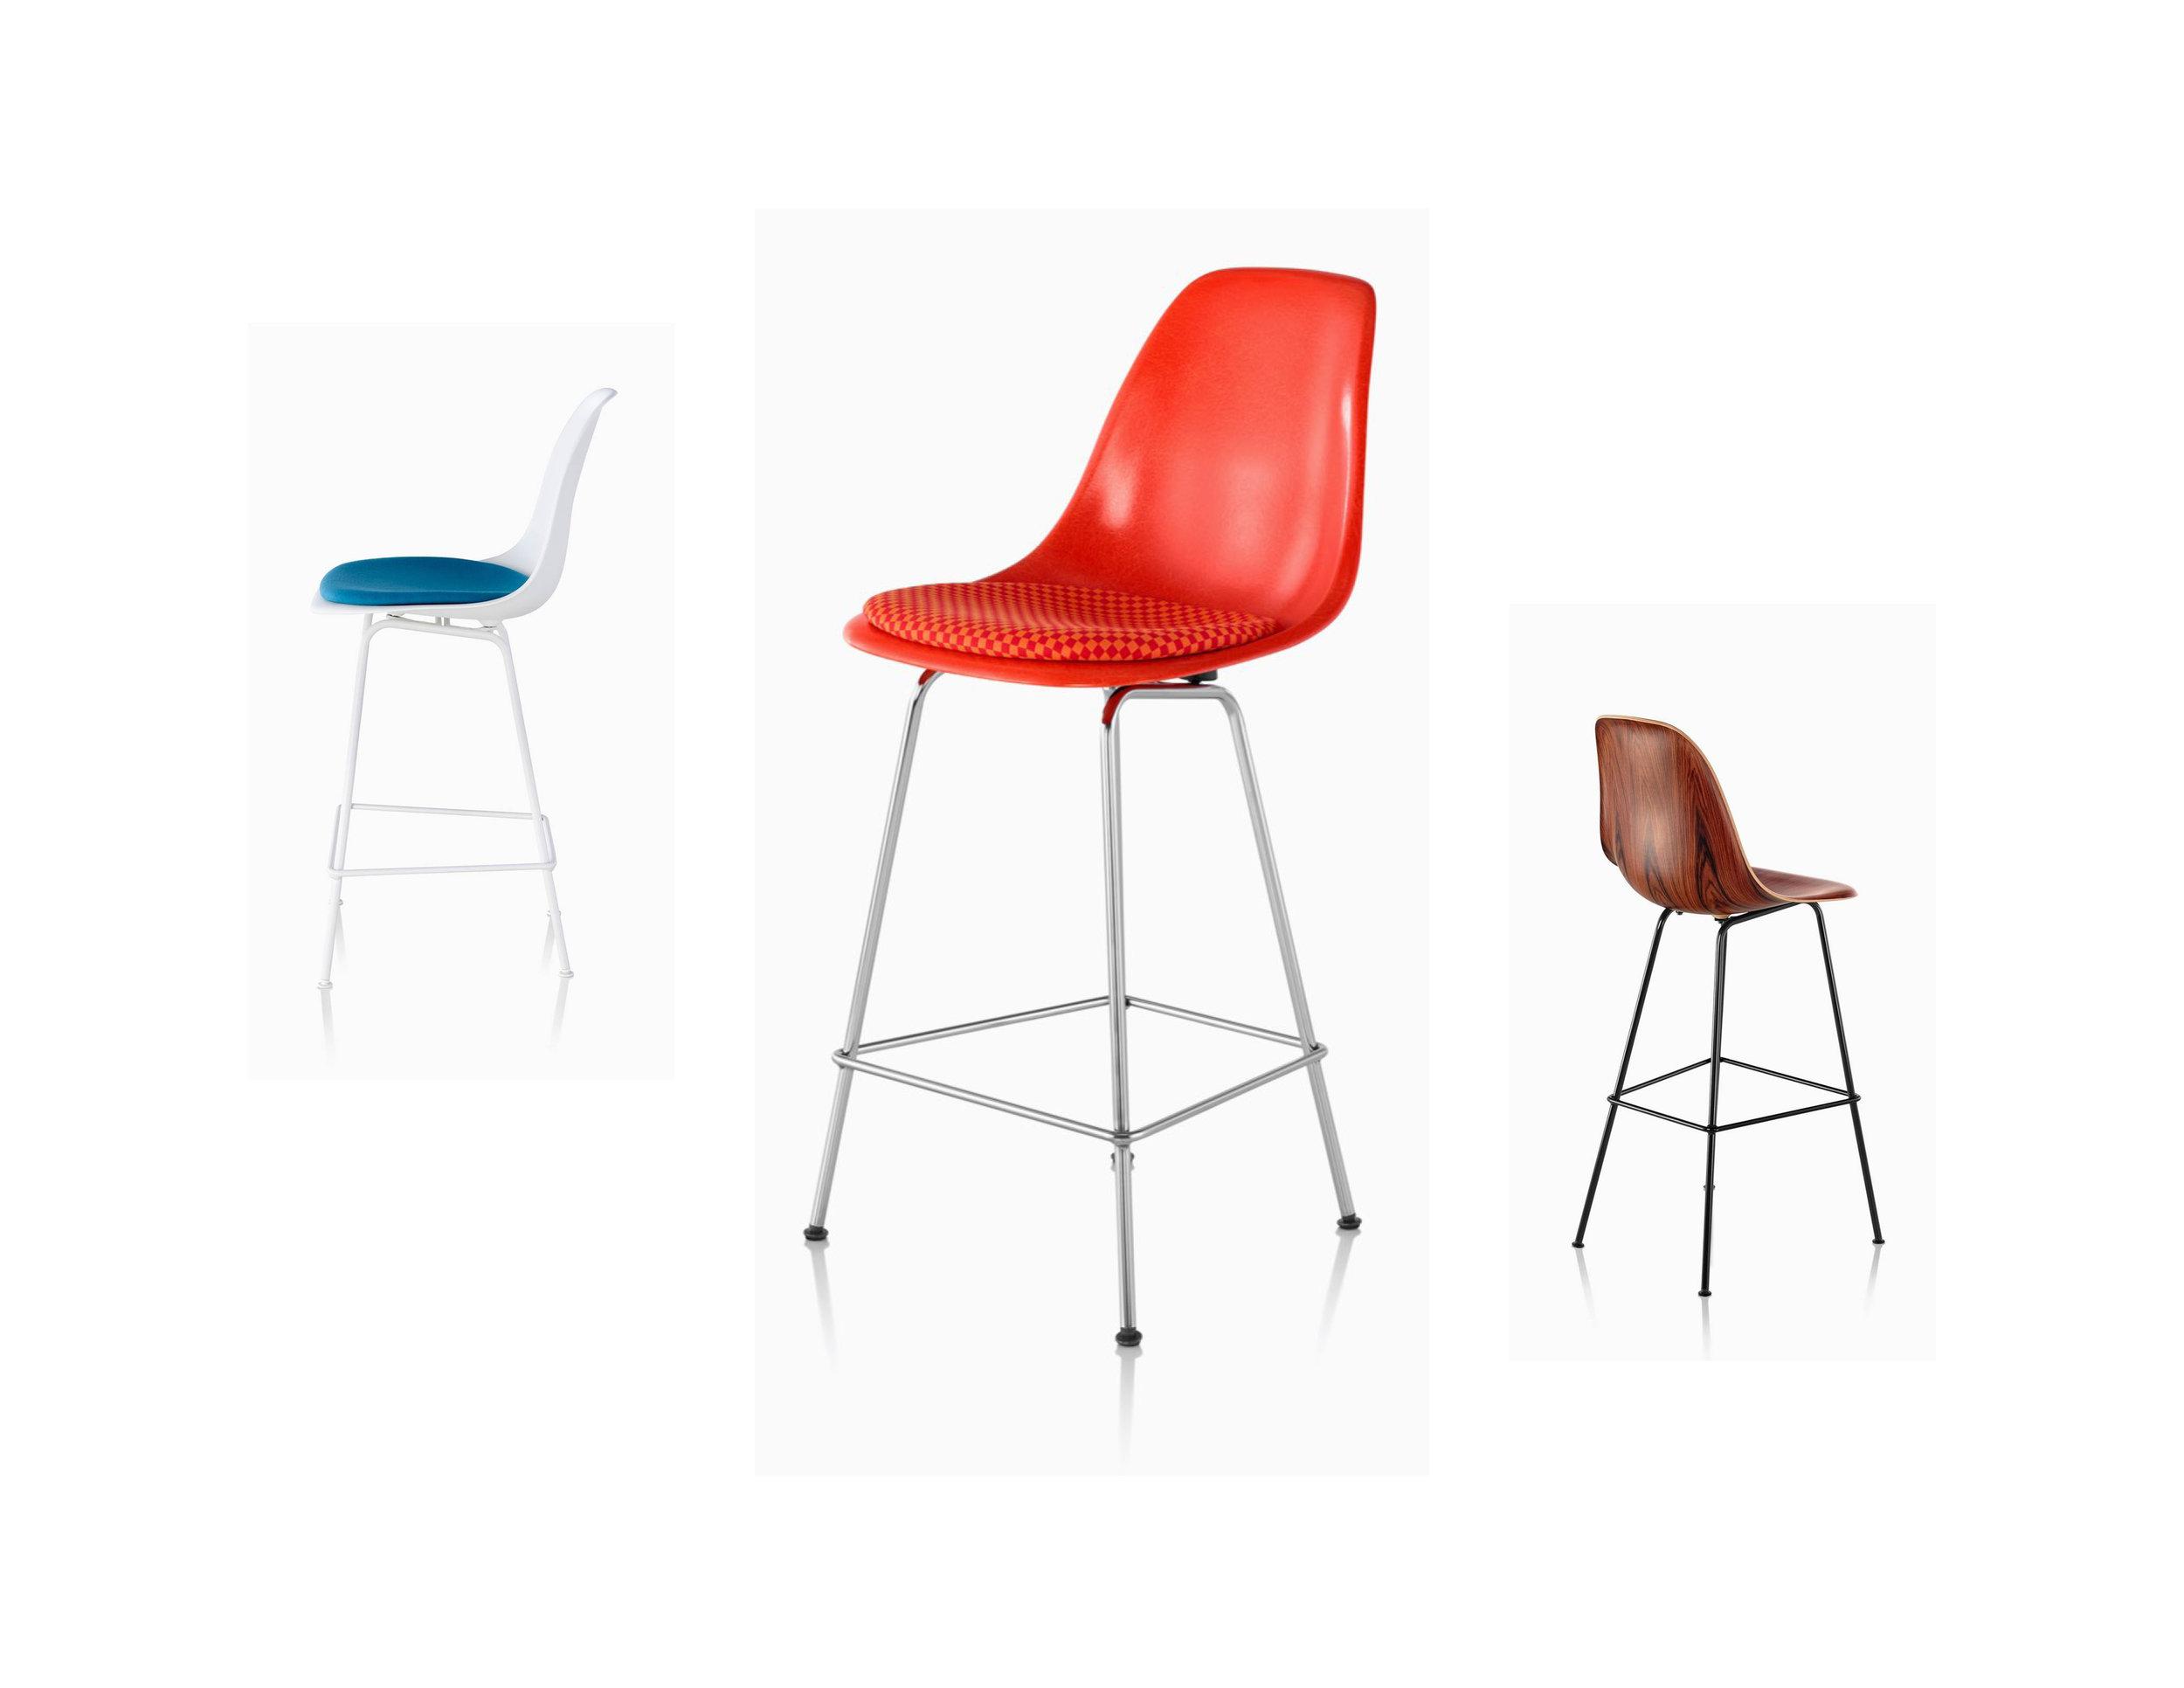 eames molded stool.jpg